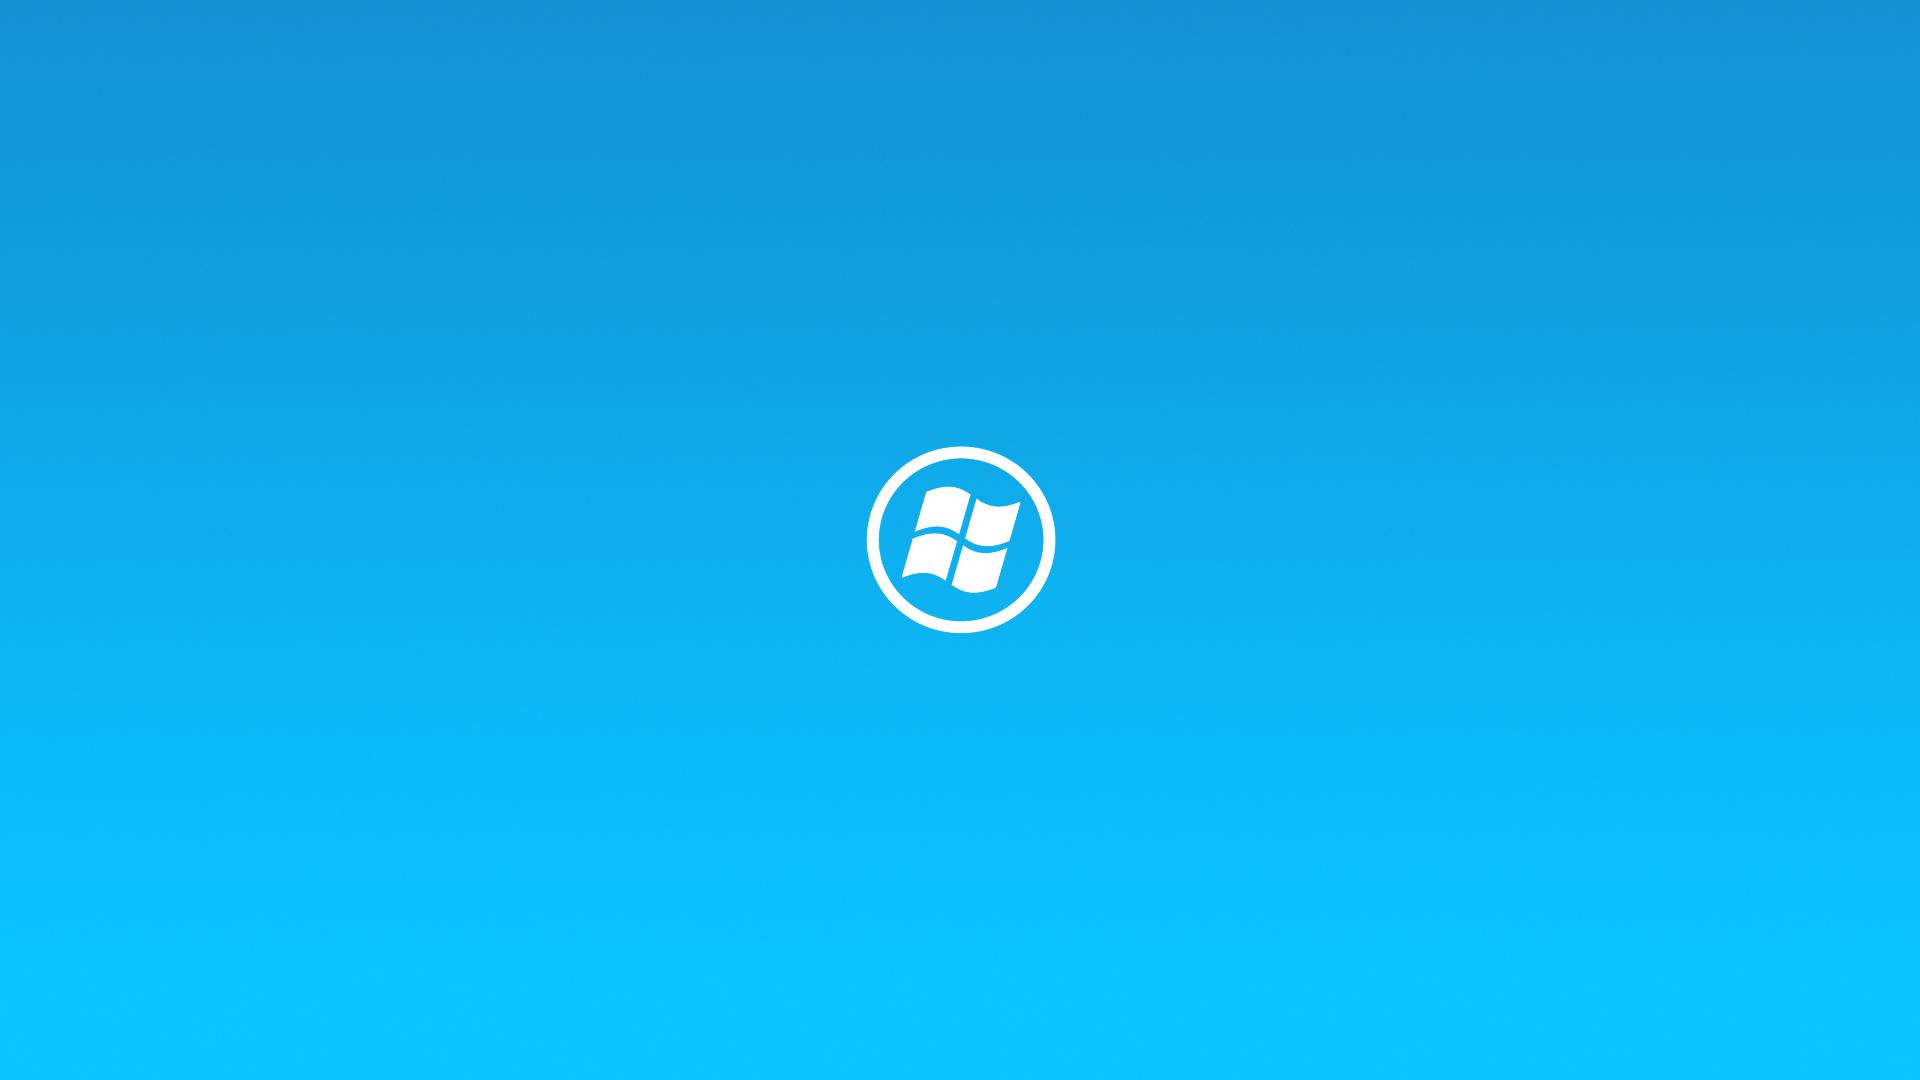 Windows 8 Blue by clsidfft3g Windows 8 Blue by clsidfft3g